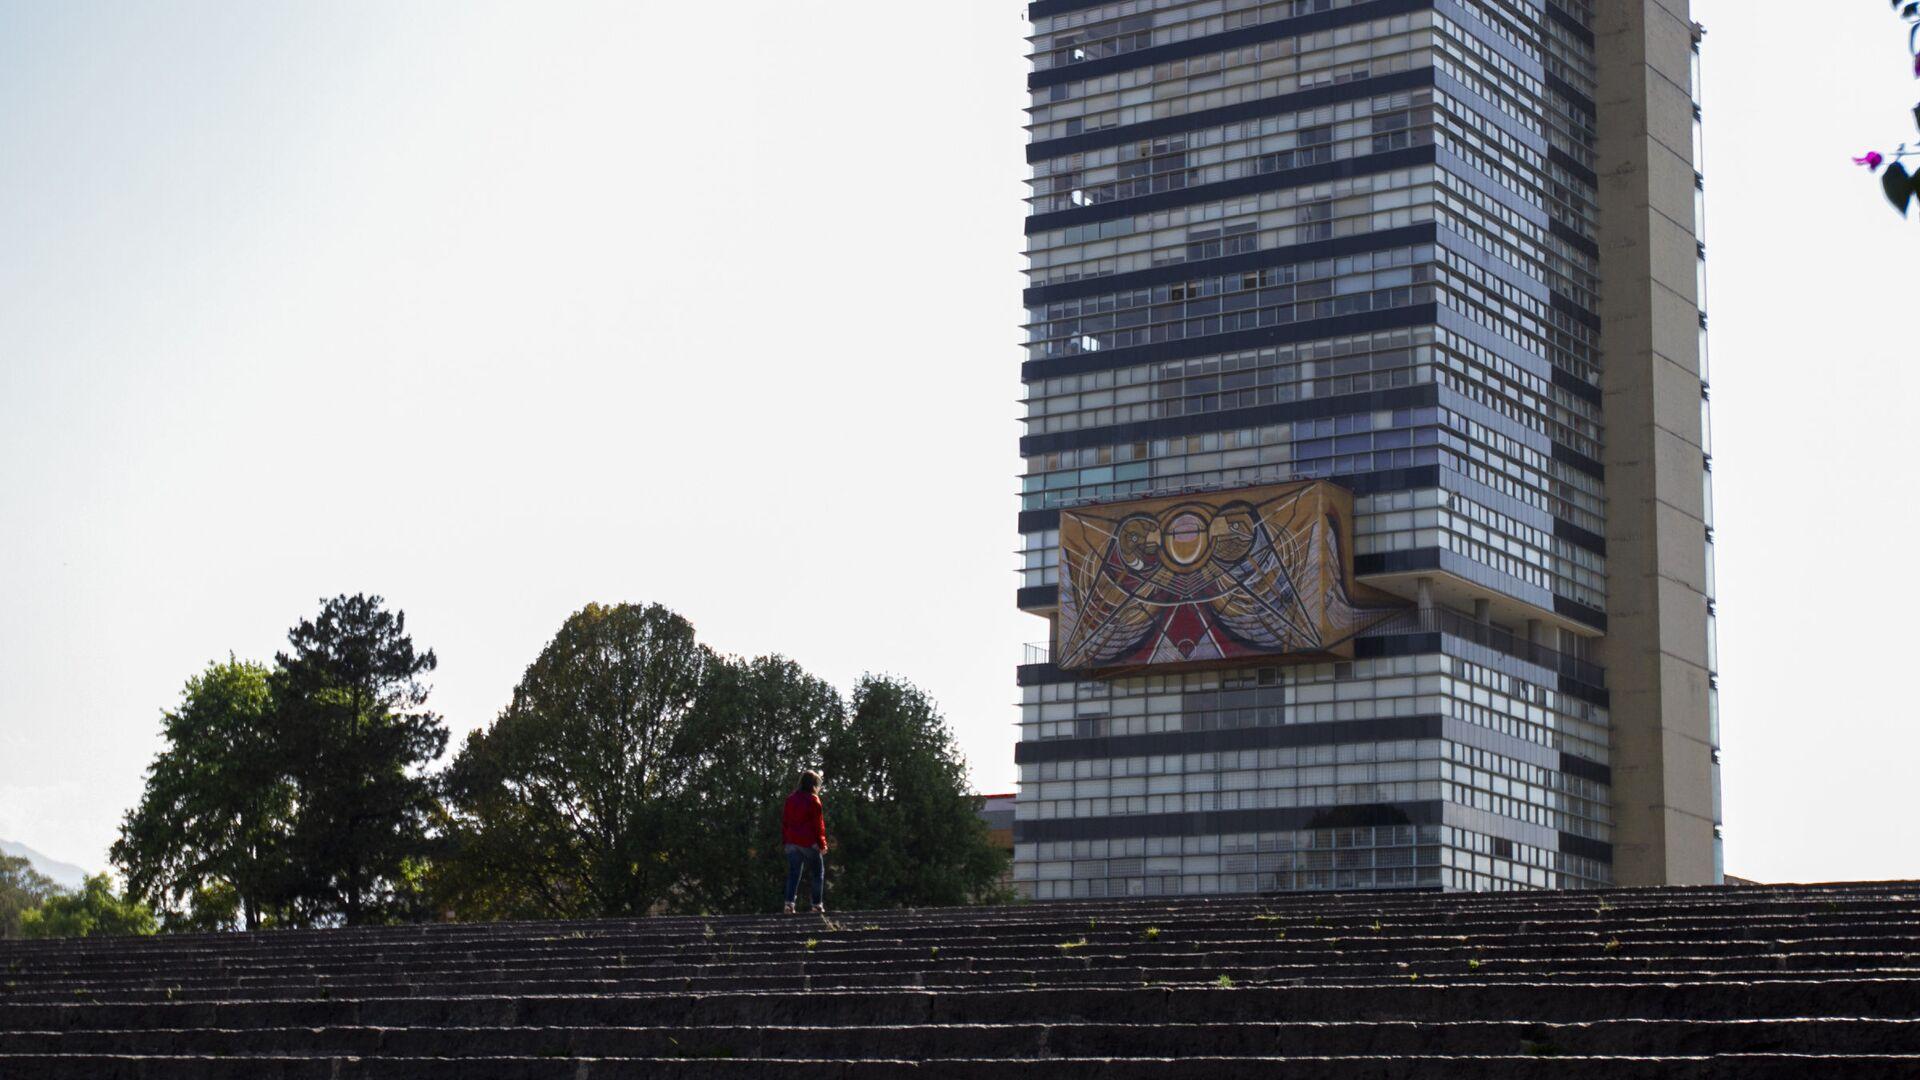 El edificio de la Universidad Nacional Autónoma de México (UNAM) - Sputnik Mundo, 1920, 30.03.2021